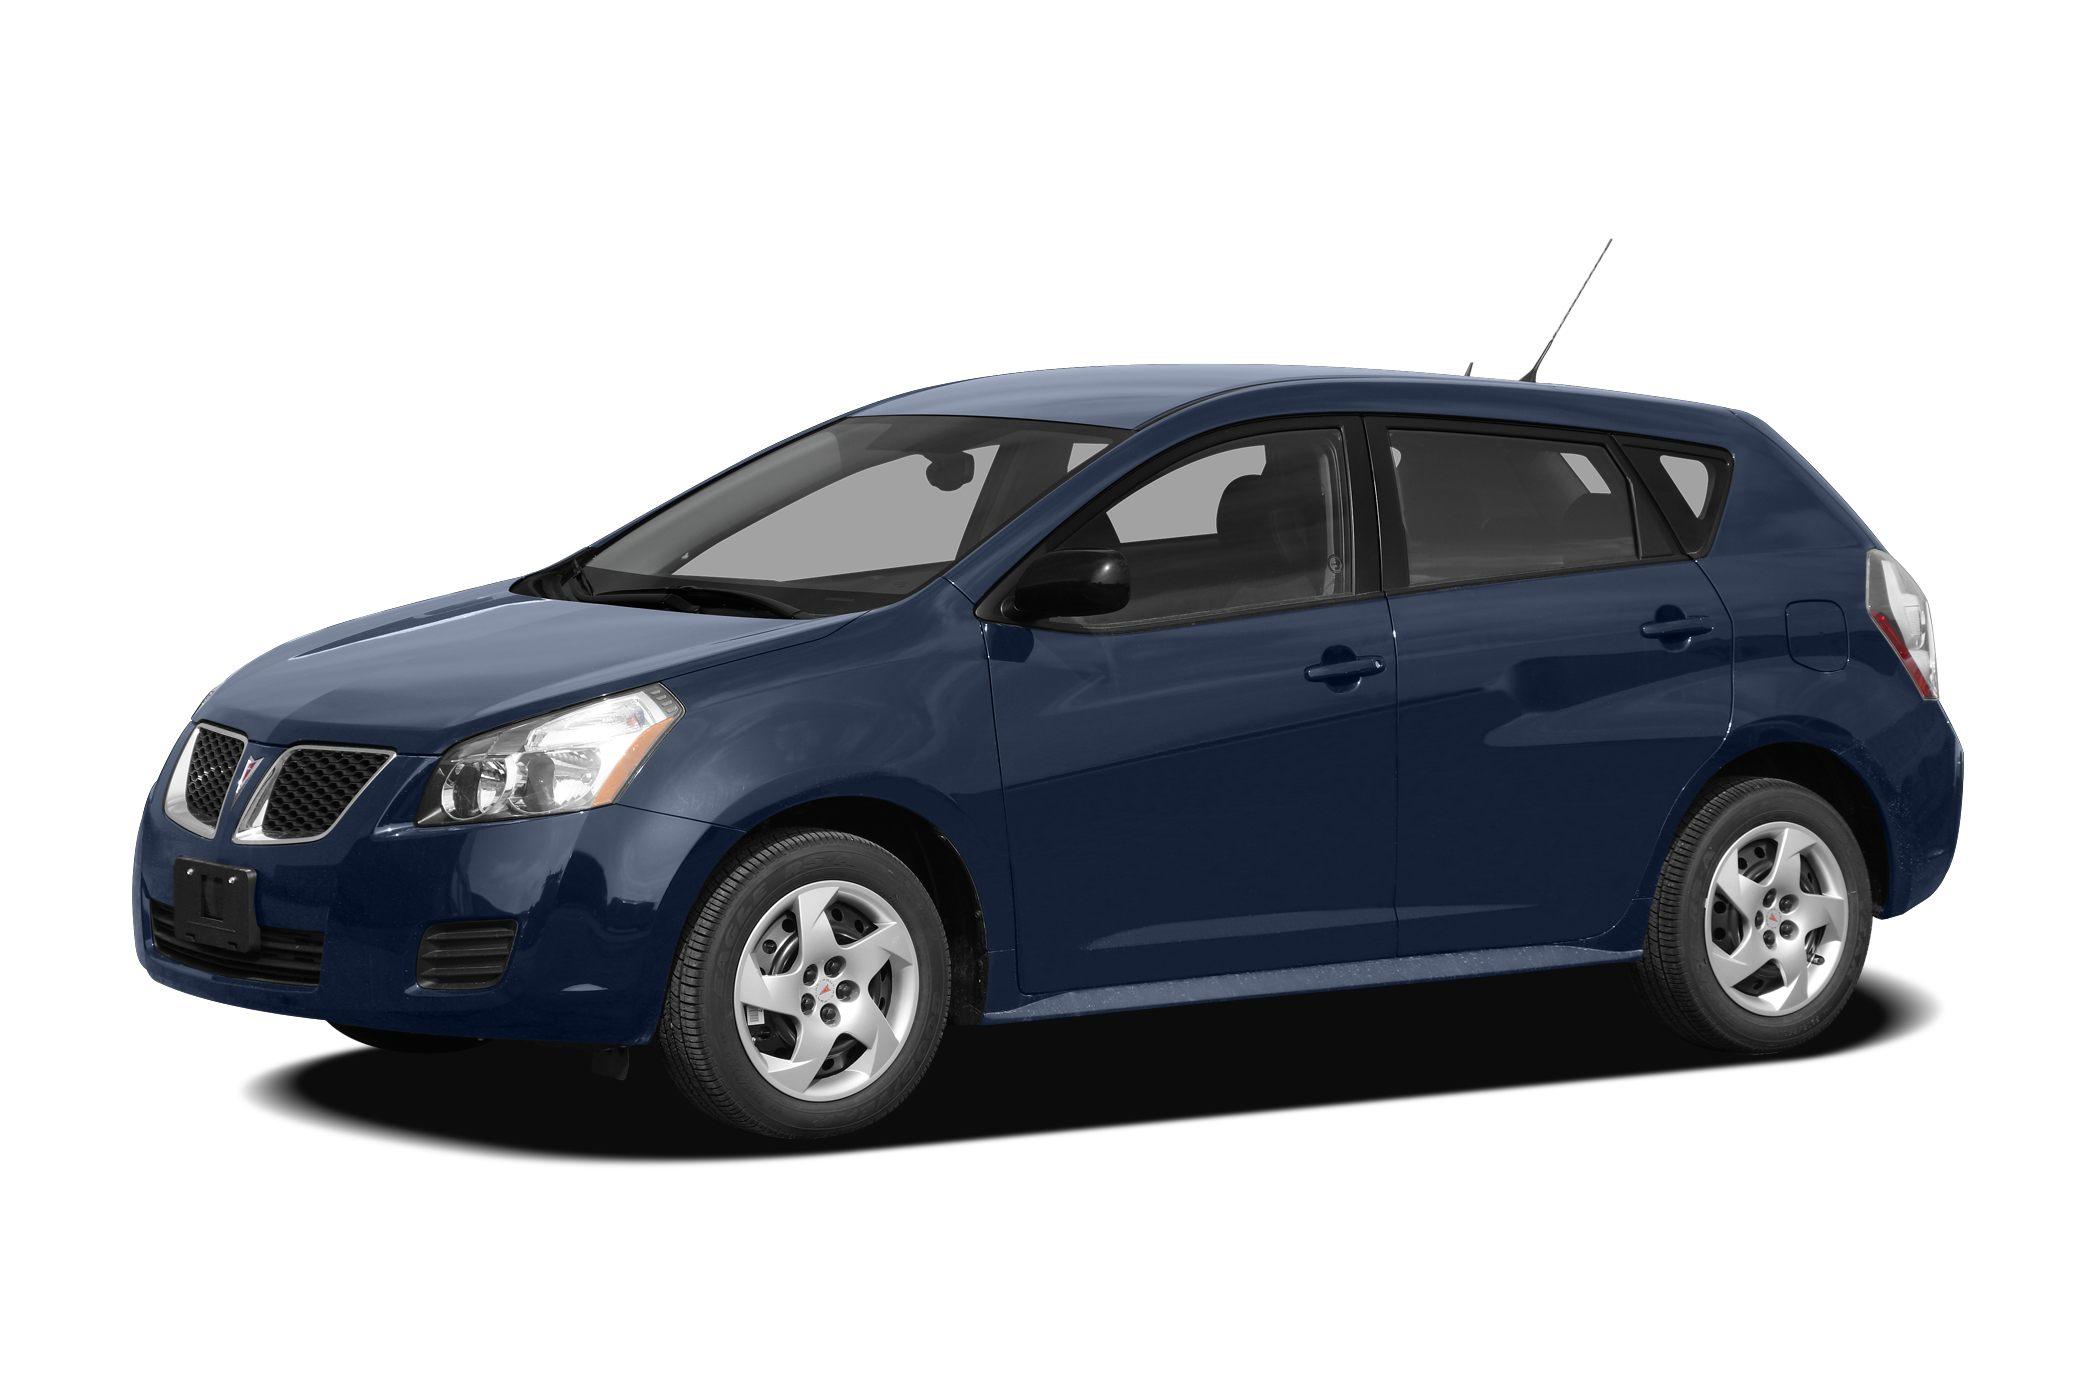 2009 Pontiac Vibe